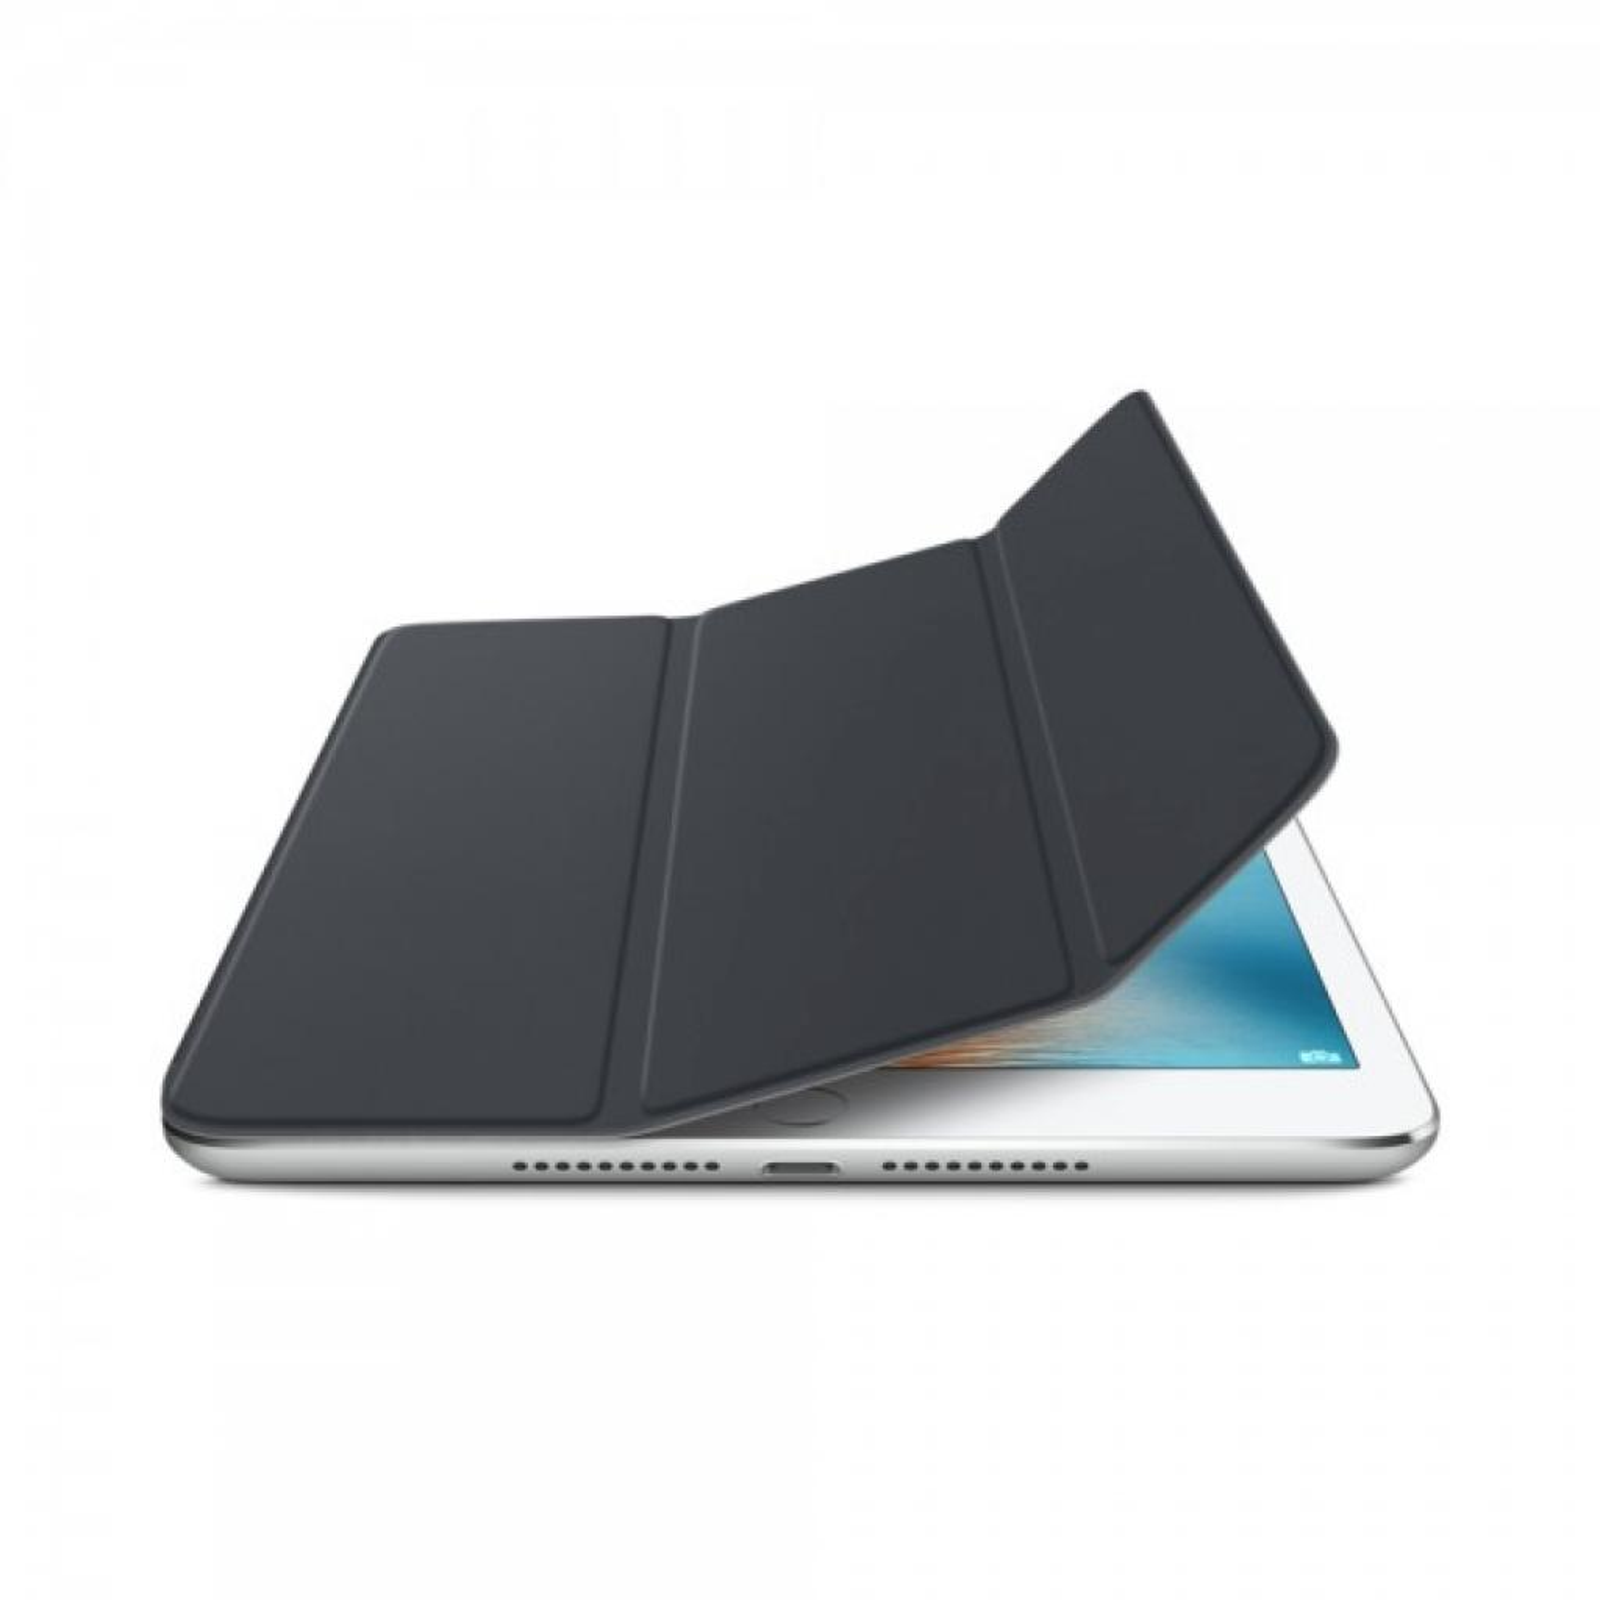 Чехол для планшета Apple Smart Cover для iPad mini 4 Charcoal Gray (MKLV2ZM/A) изображение 2